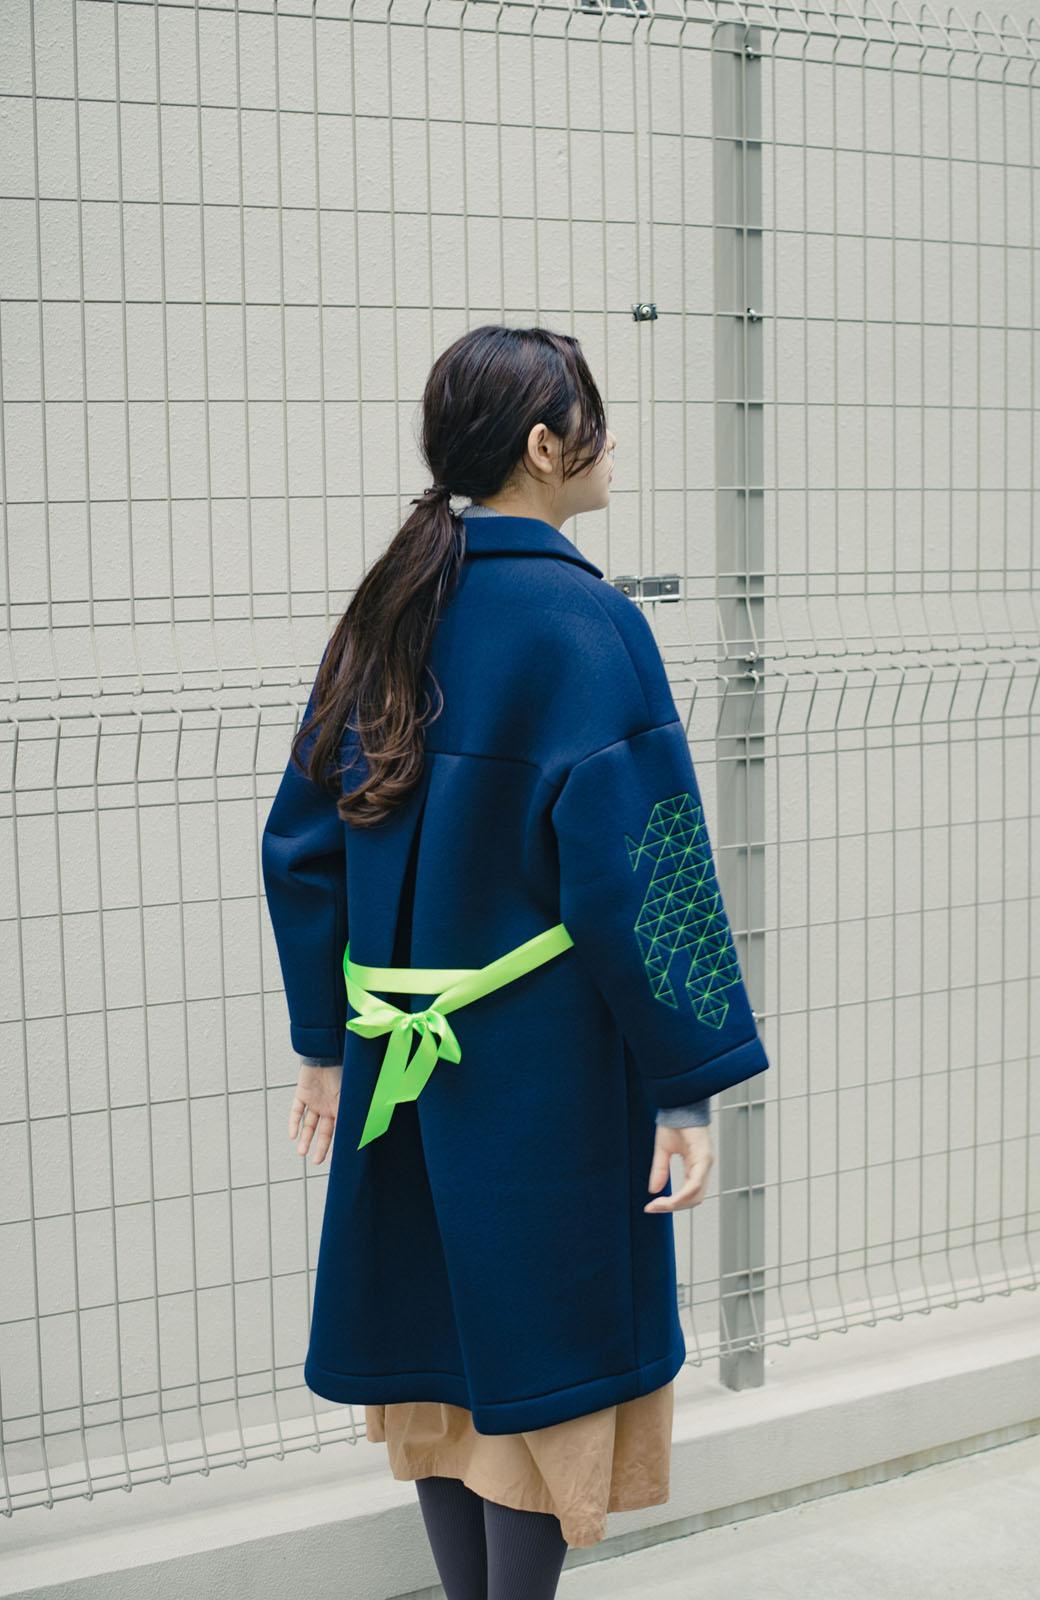 haco! haco! × RBTXCOネオンカラーで気分もUP!DOGUU(土偶)刺繍と蛍光リボンのボンディングコート <ネイビー>の商品写真16